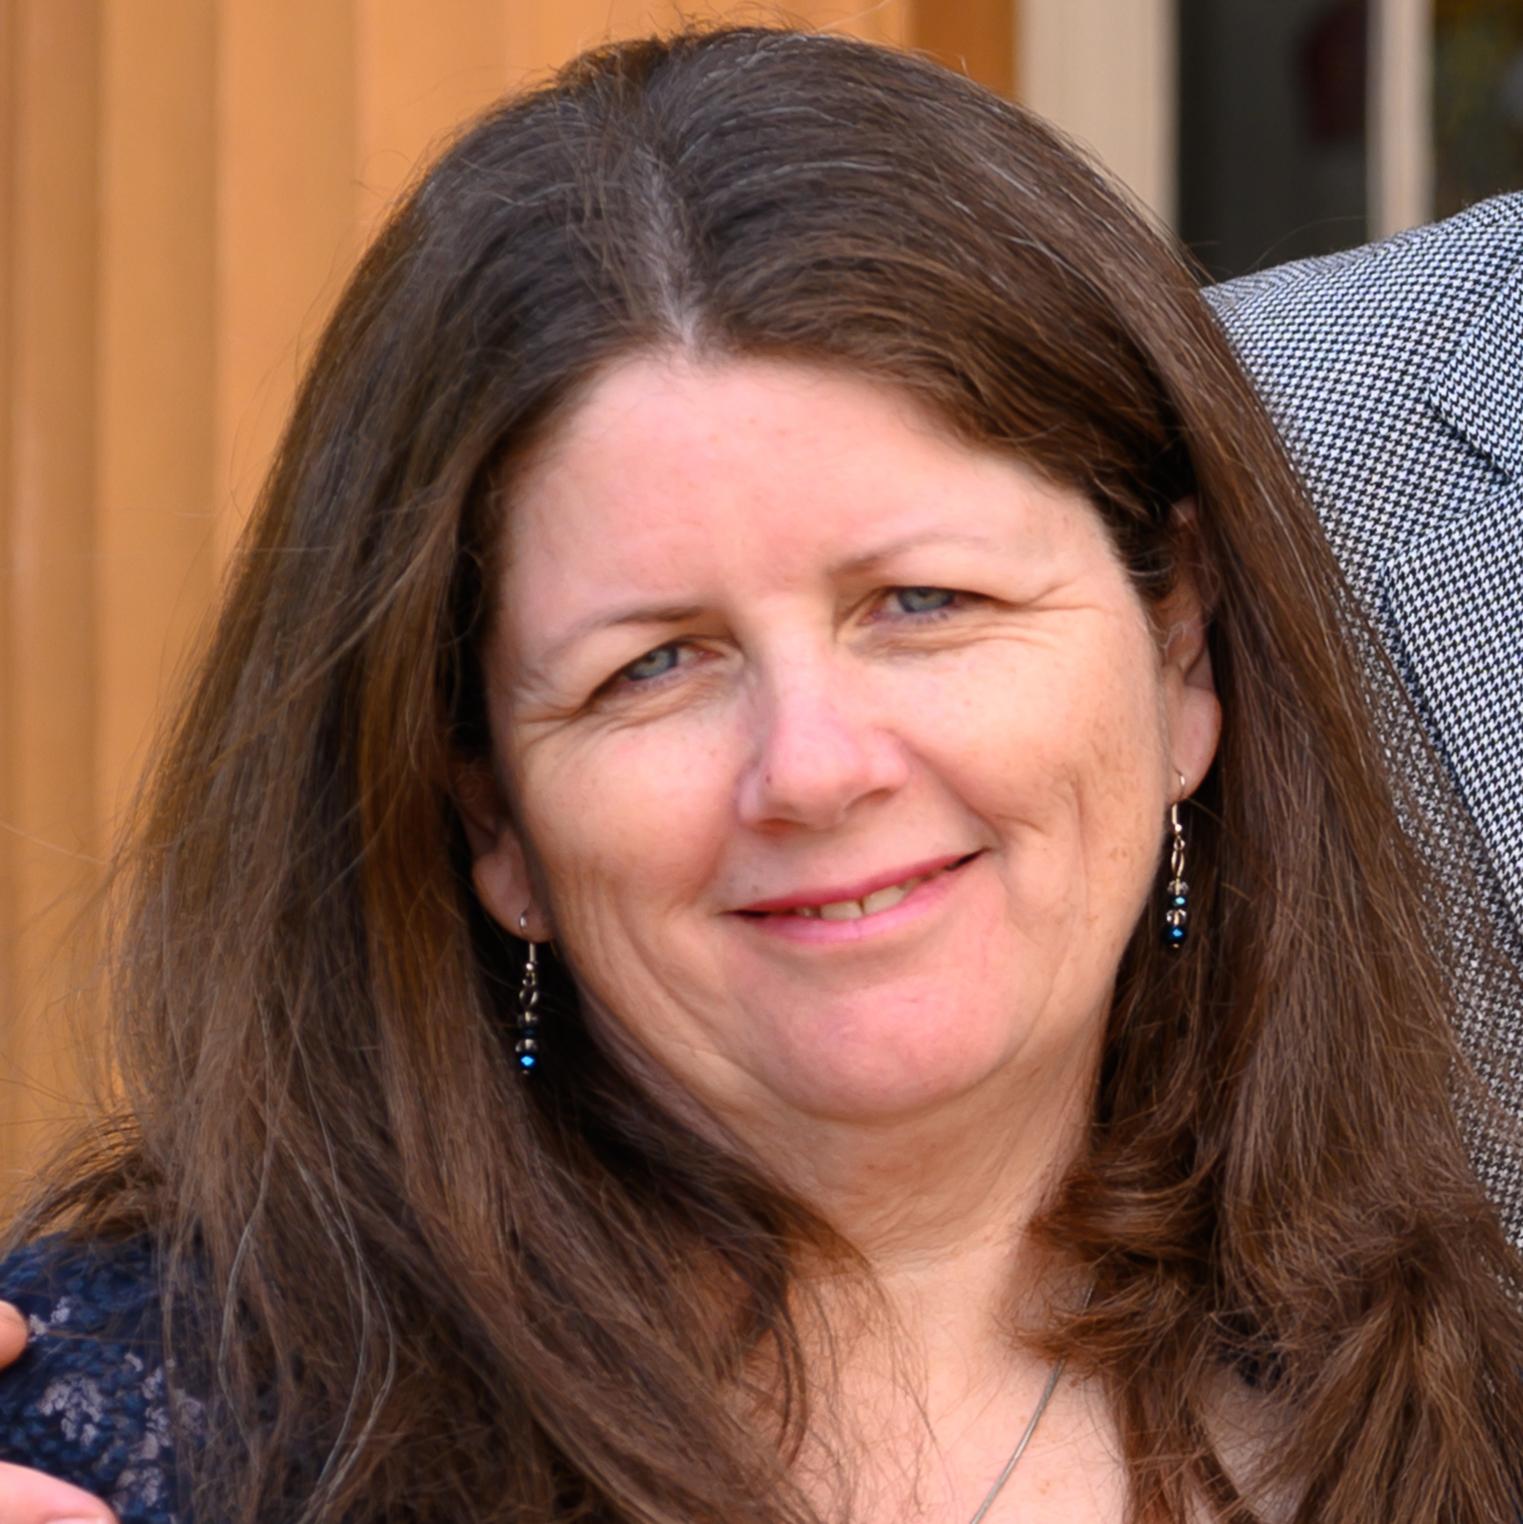 Jane Finnegan